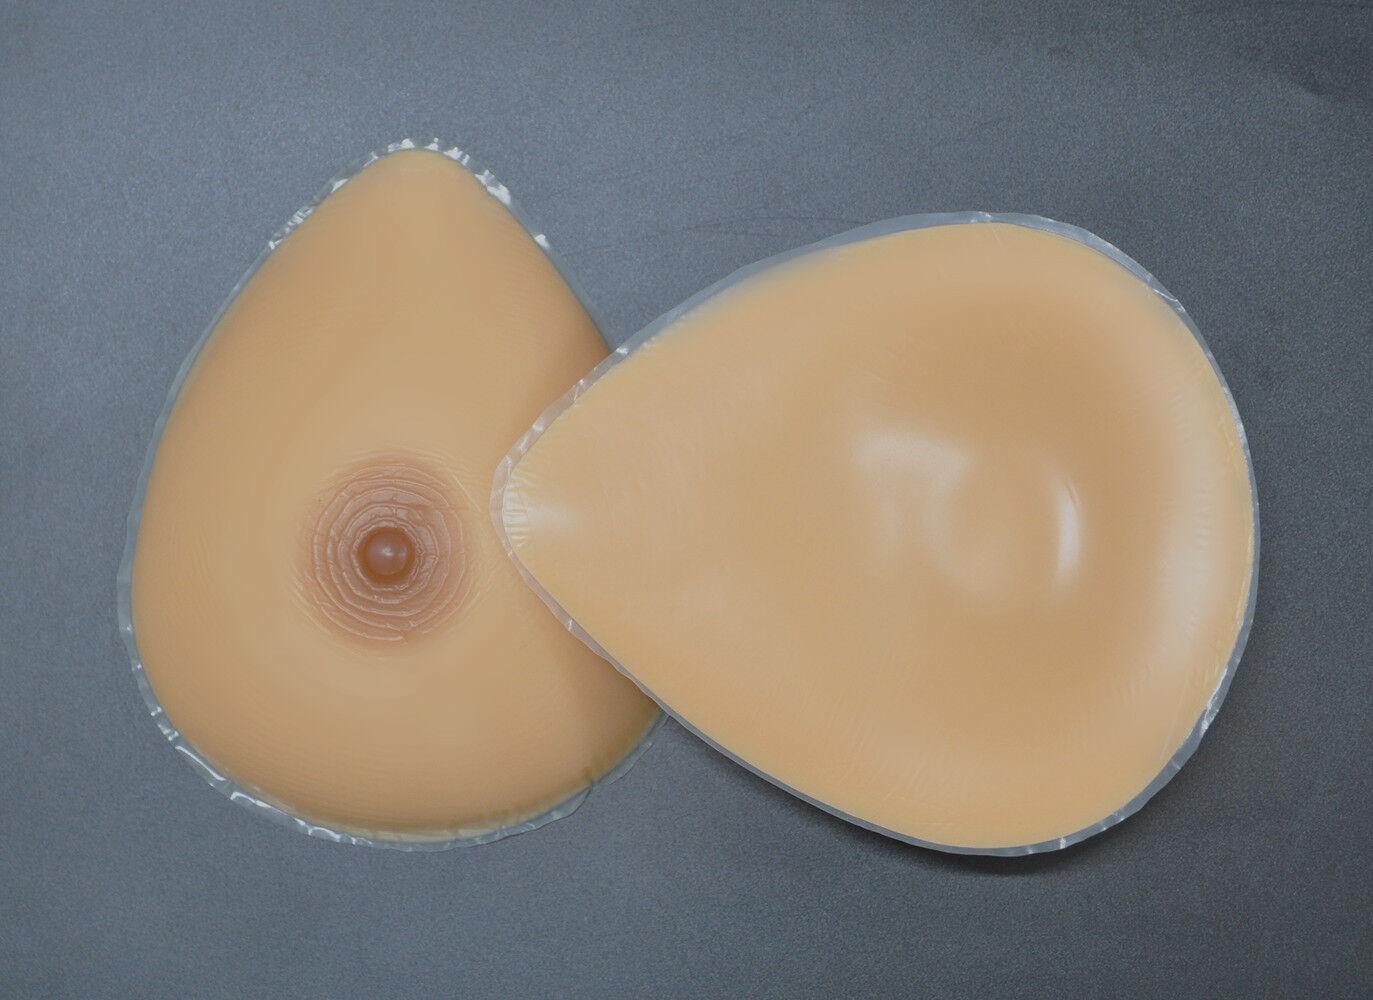 IVITA 1600g pair Fake Breast Forms Artificial Breast Crossdresser EE Cup gifts